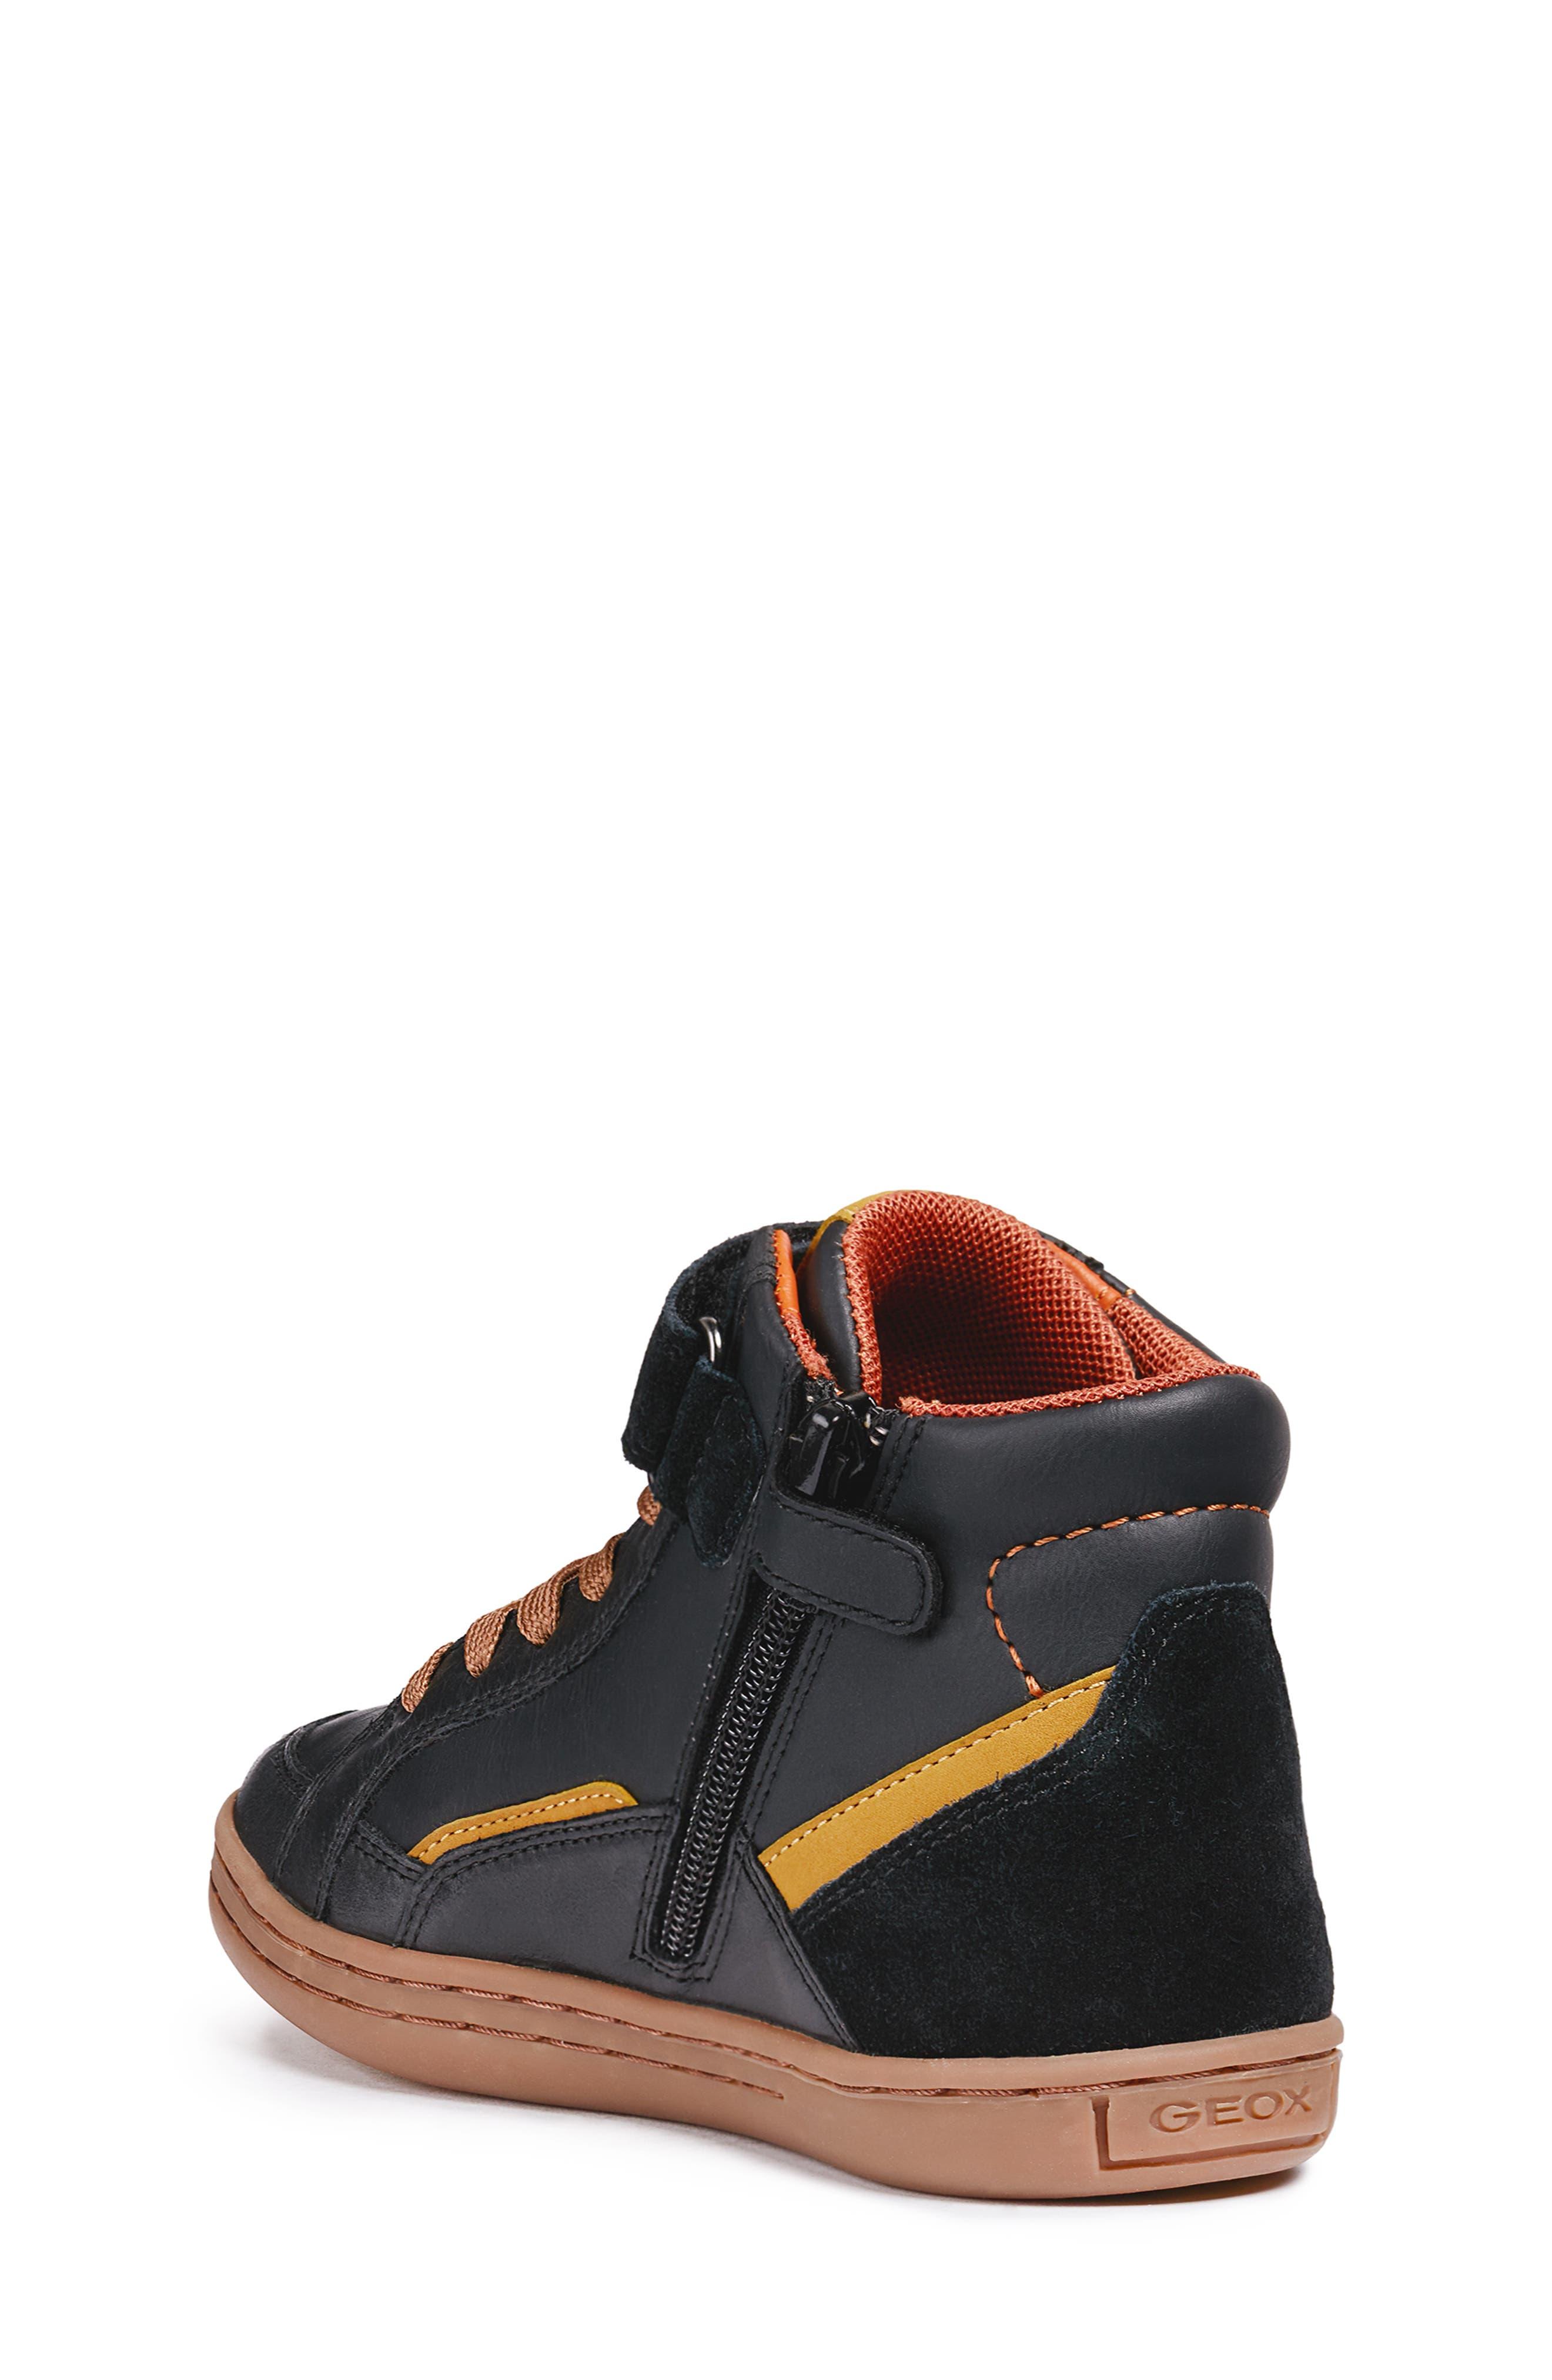 Garcia Mid Sneaker,                             Alternate thumbnail 2, color,                             BLACK/ DARK YELLOW